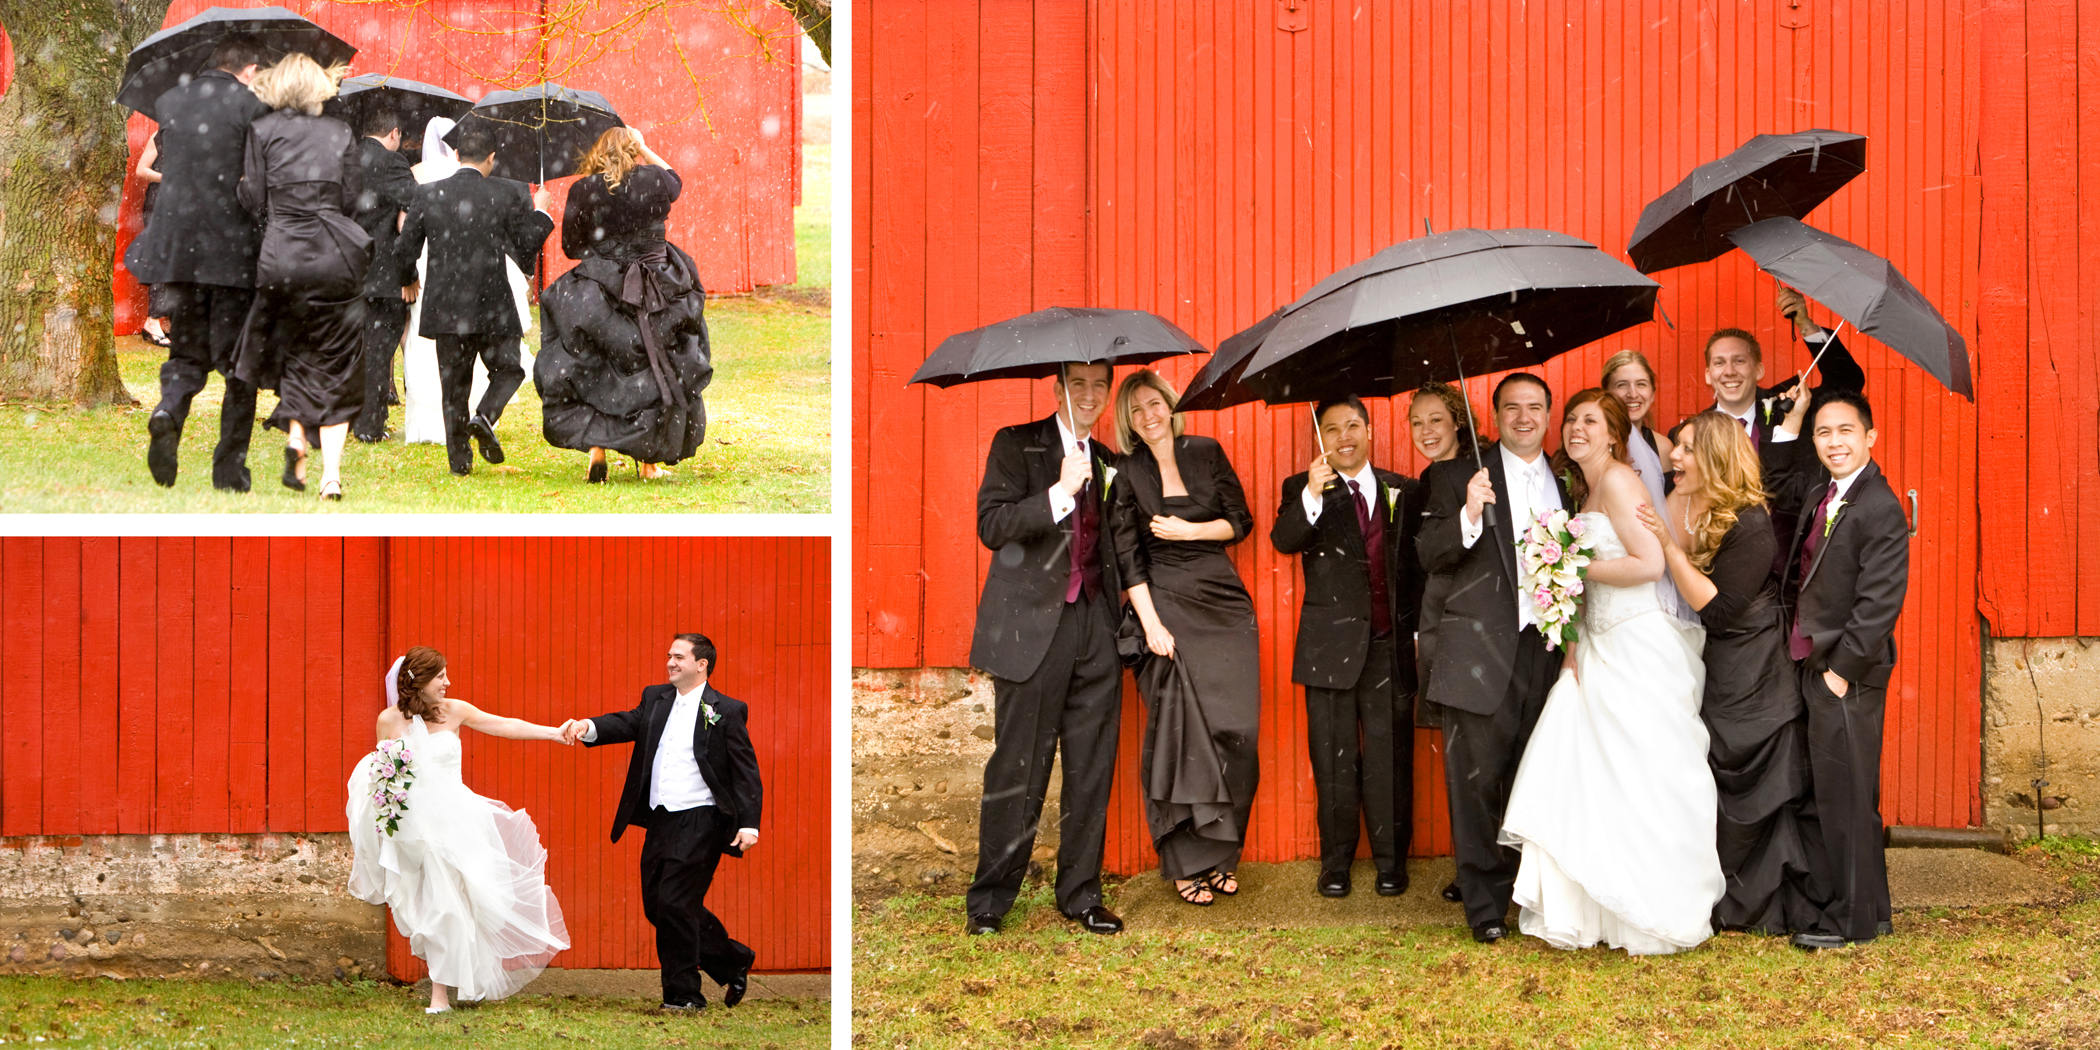 wedding-photography-Andrews-University-Berrien-Springs-Michigan_06.jpg